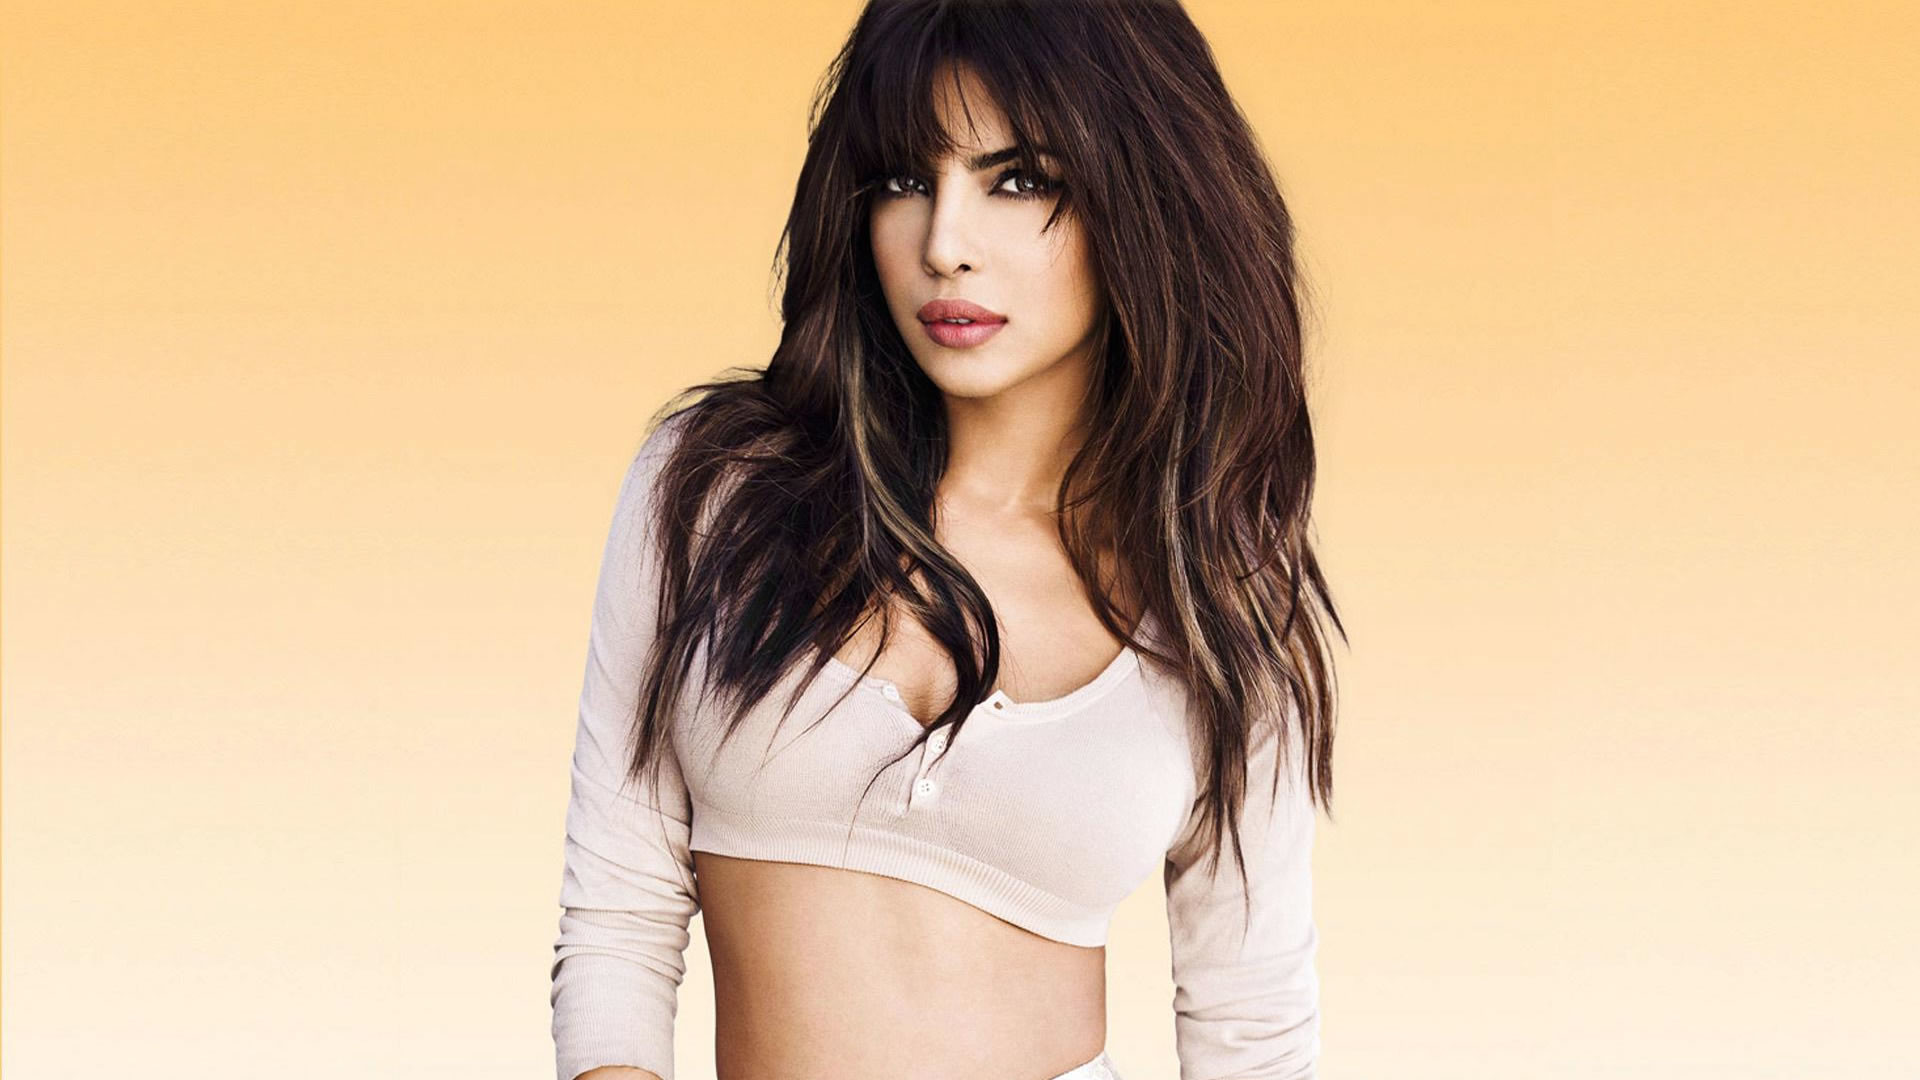 Bollywood Hindi Movies 2018 Actor Name: Latest Bollywood Actress Wallpapers 2018 HD (74+ Images